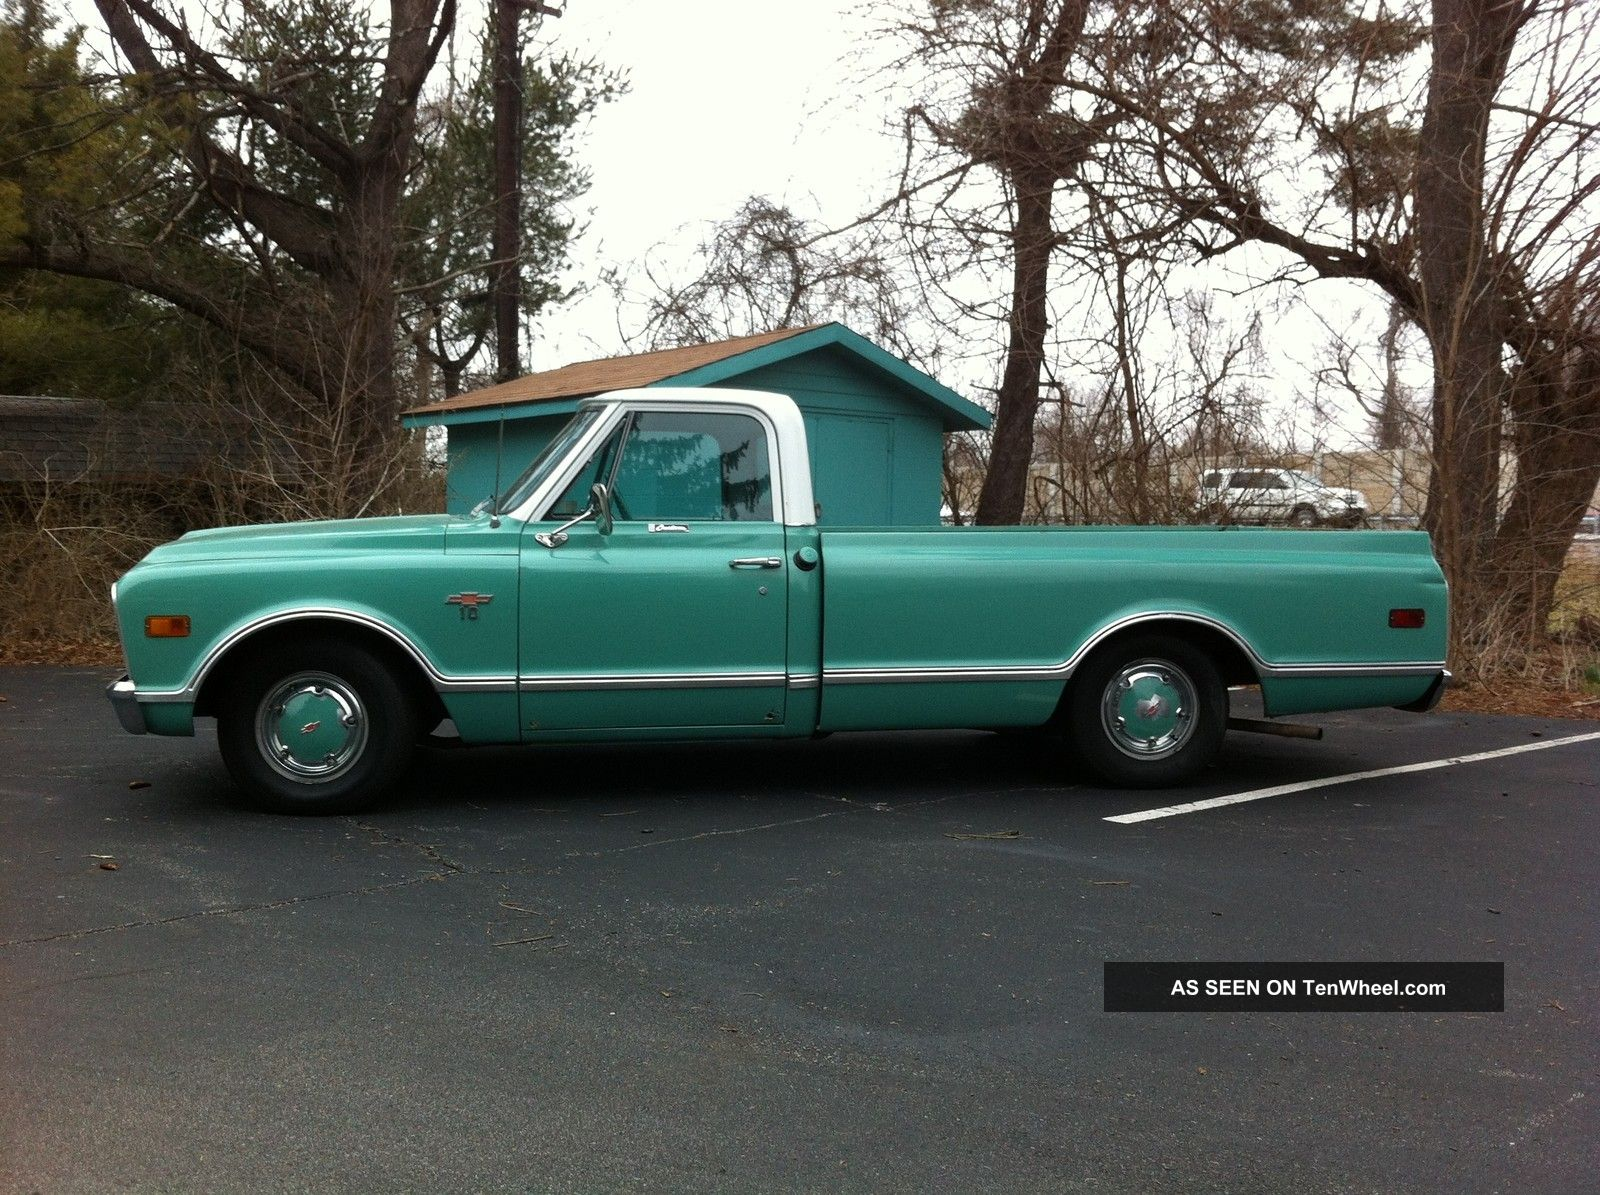 1968 Chevy C10 Lwb Fleet Side Classic Truck Pickup